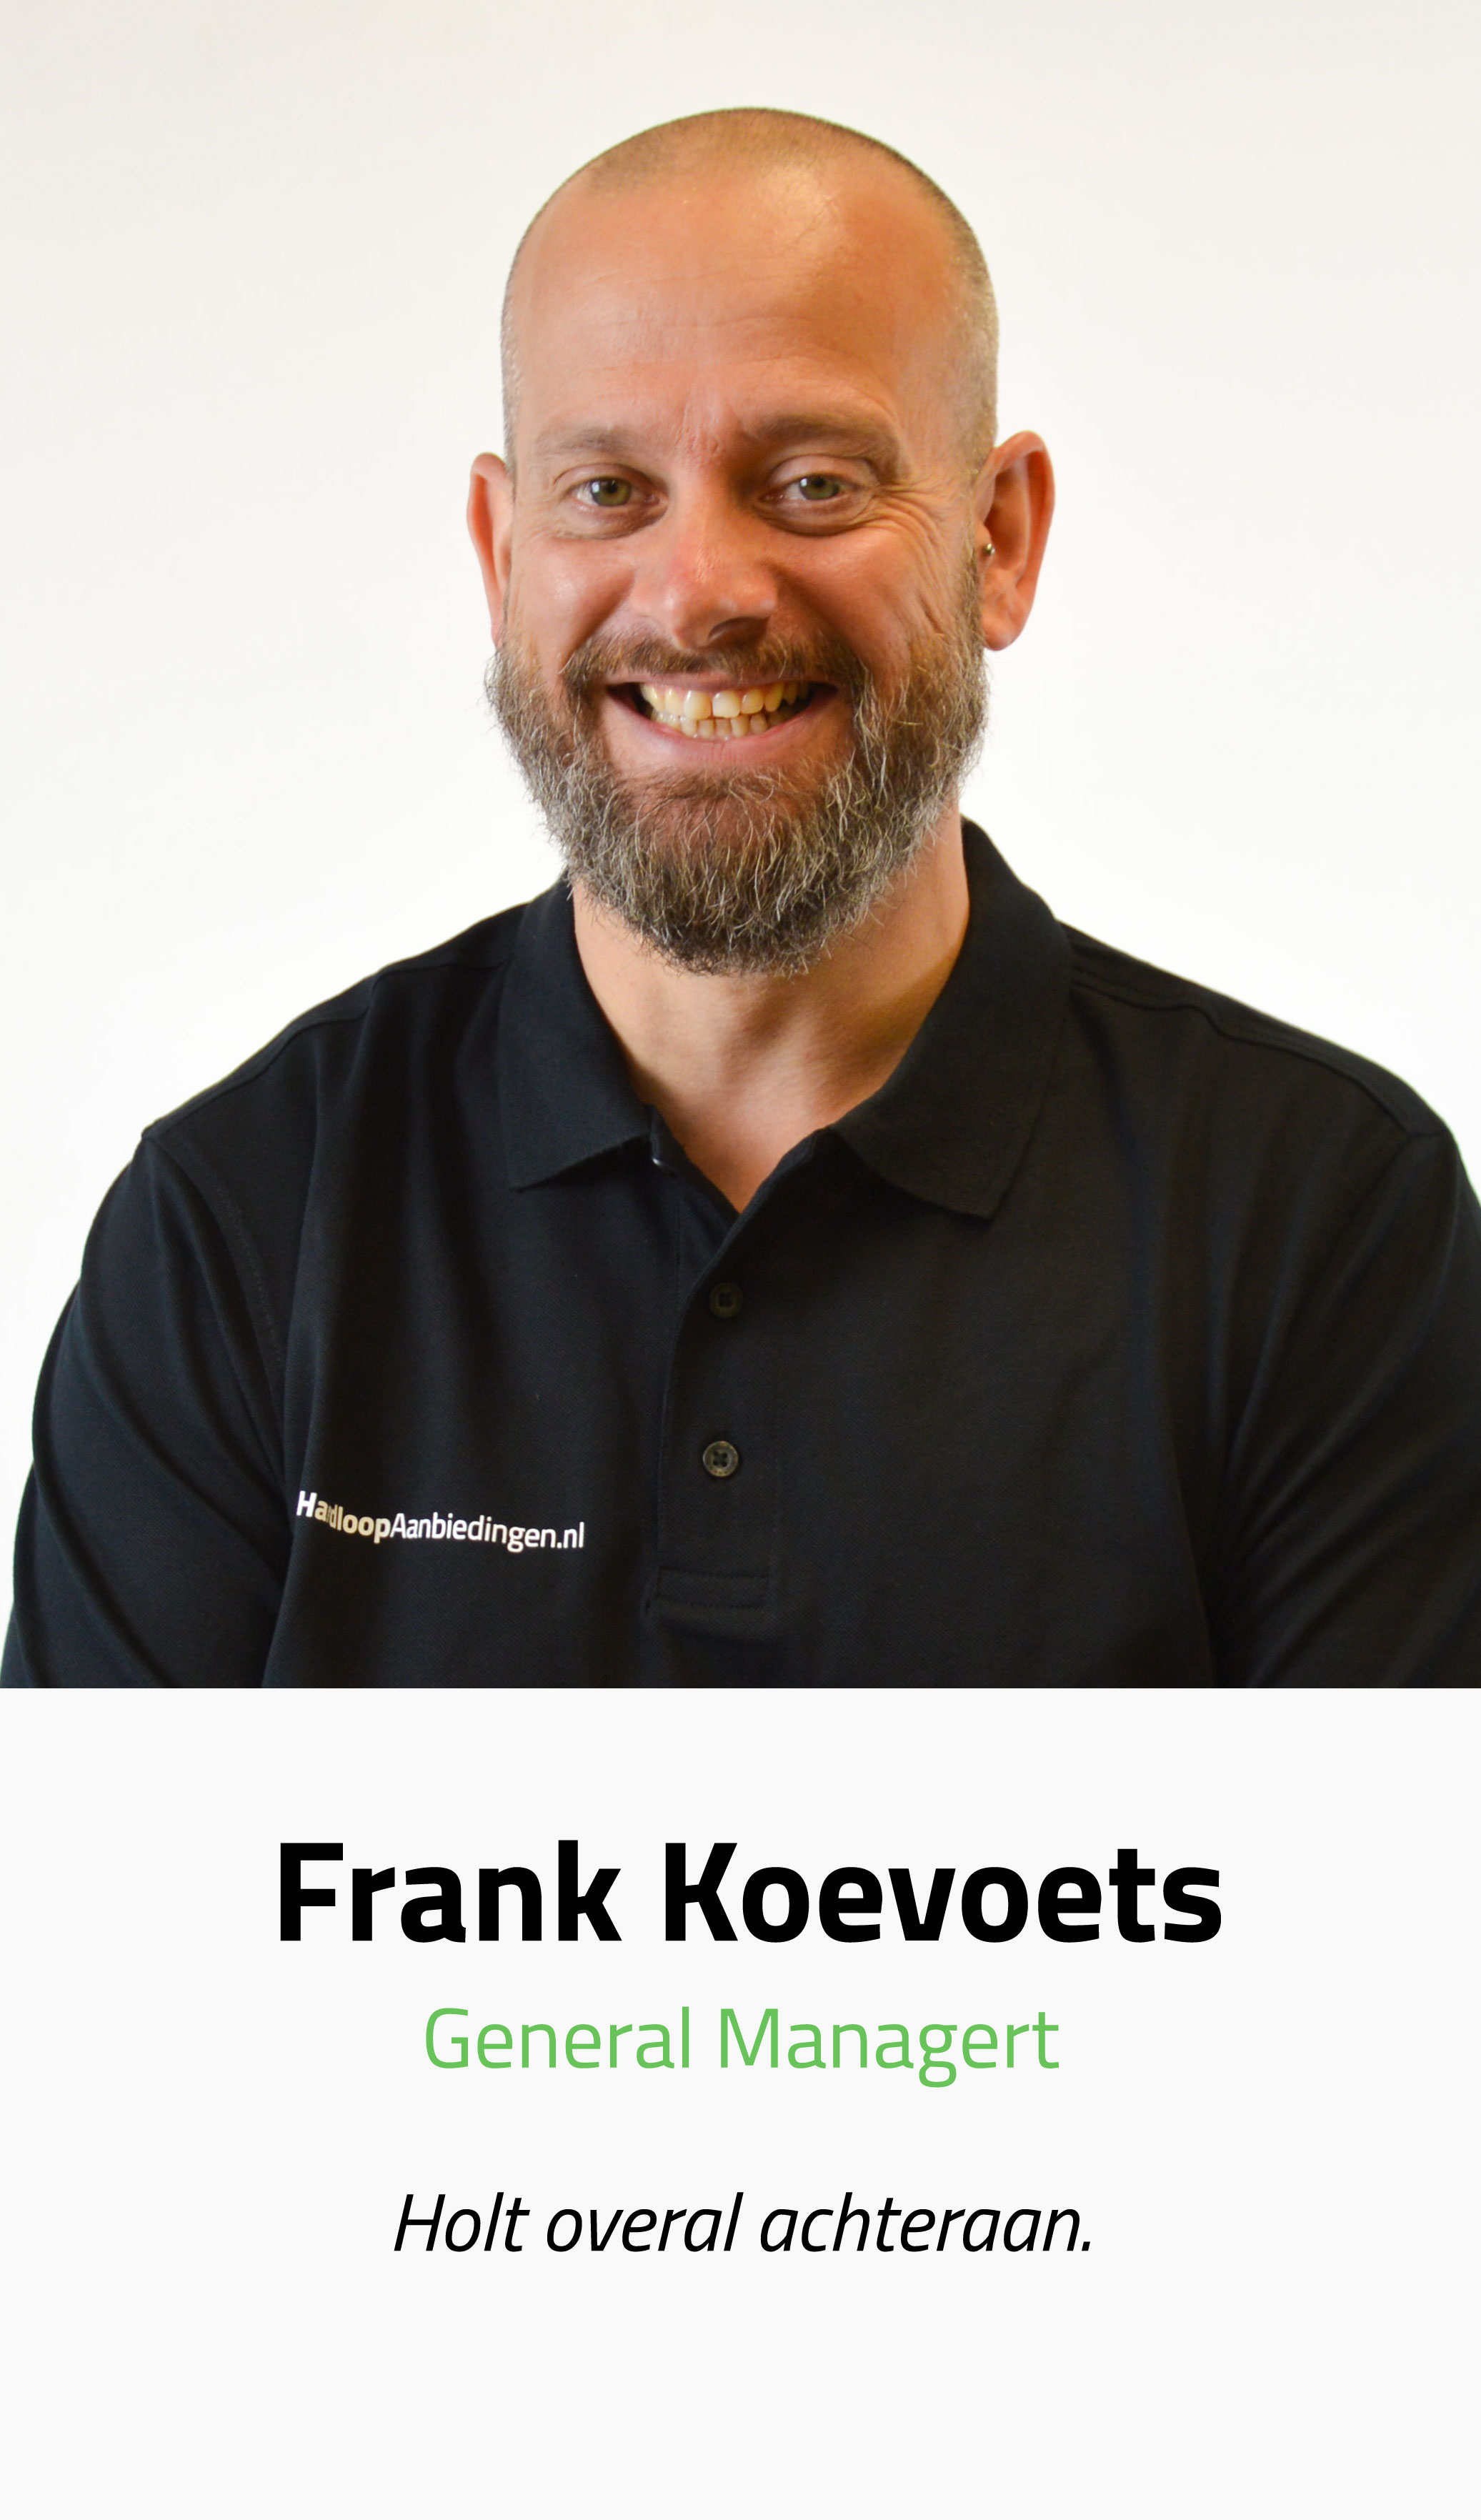 Frank | Hardloopaanbiedingen.nl